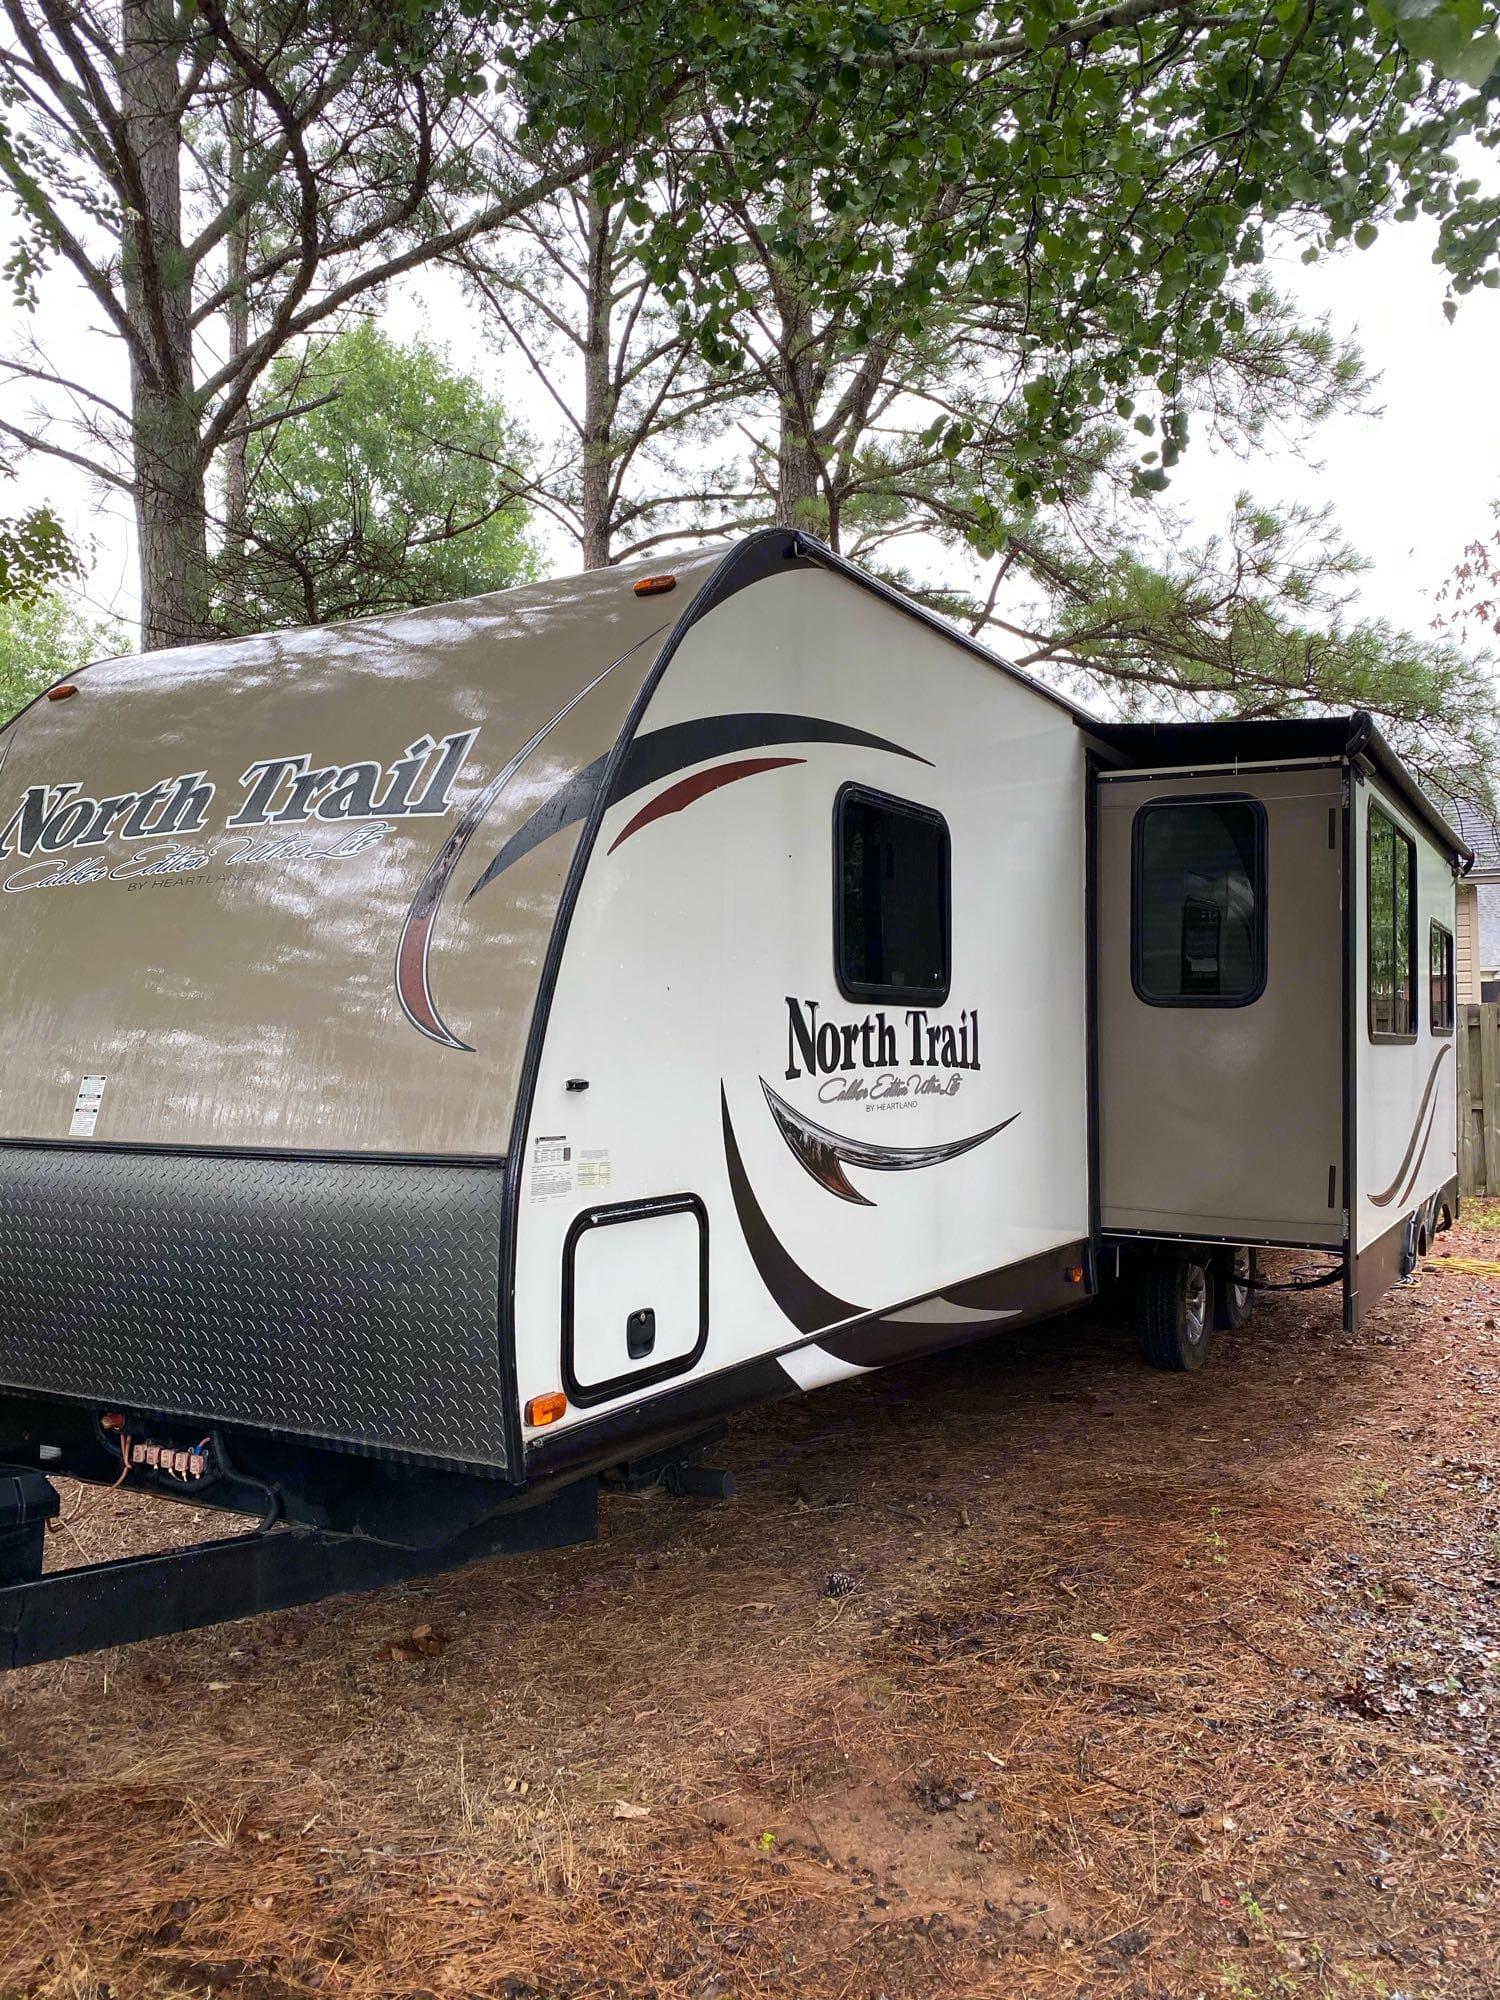 Heartland North Trail 2017